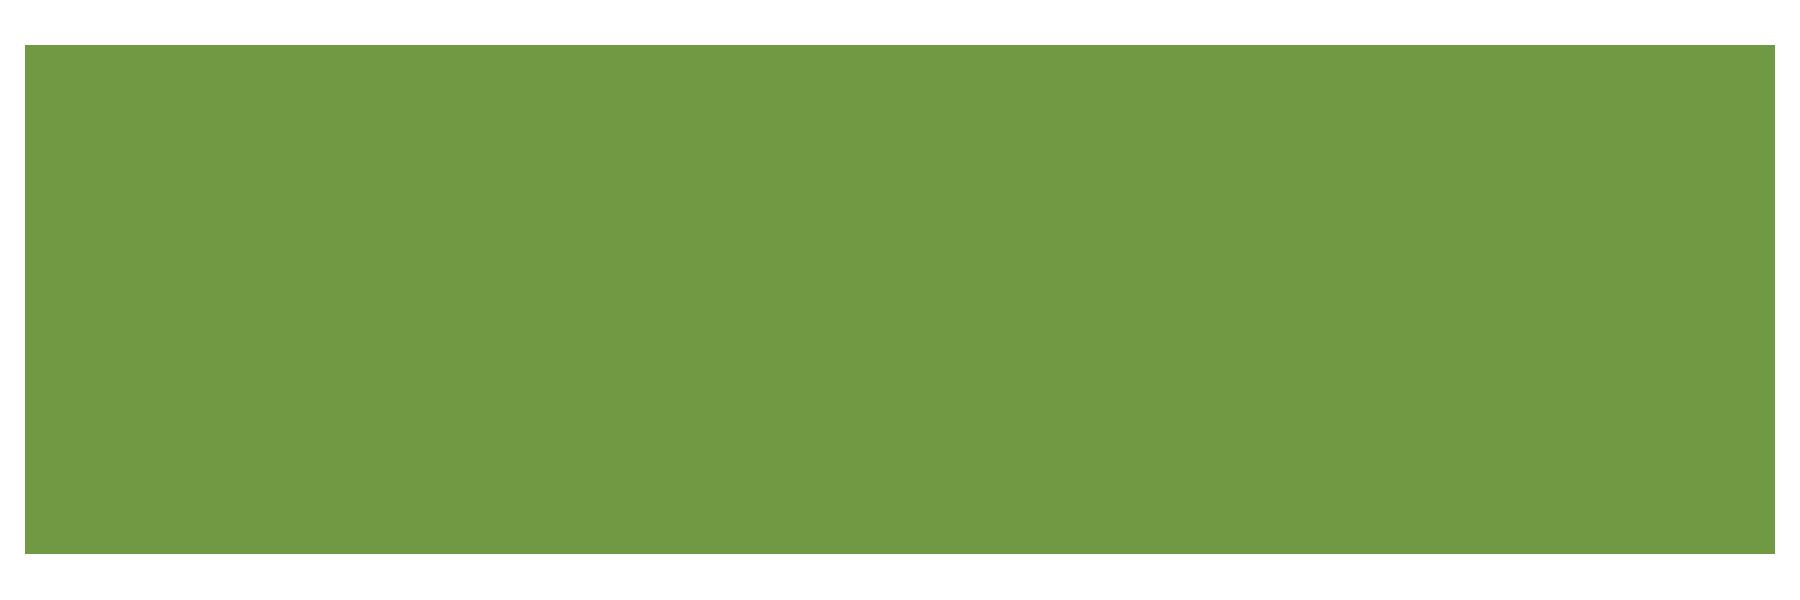 Shuswap North Okanagan Rail Trail (Sicamous to Armstrong